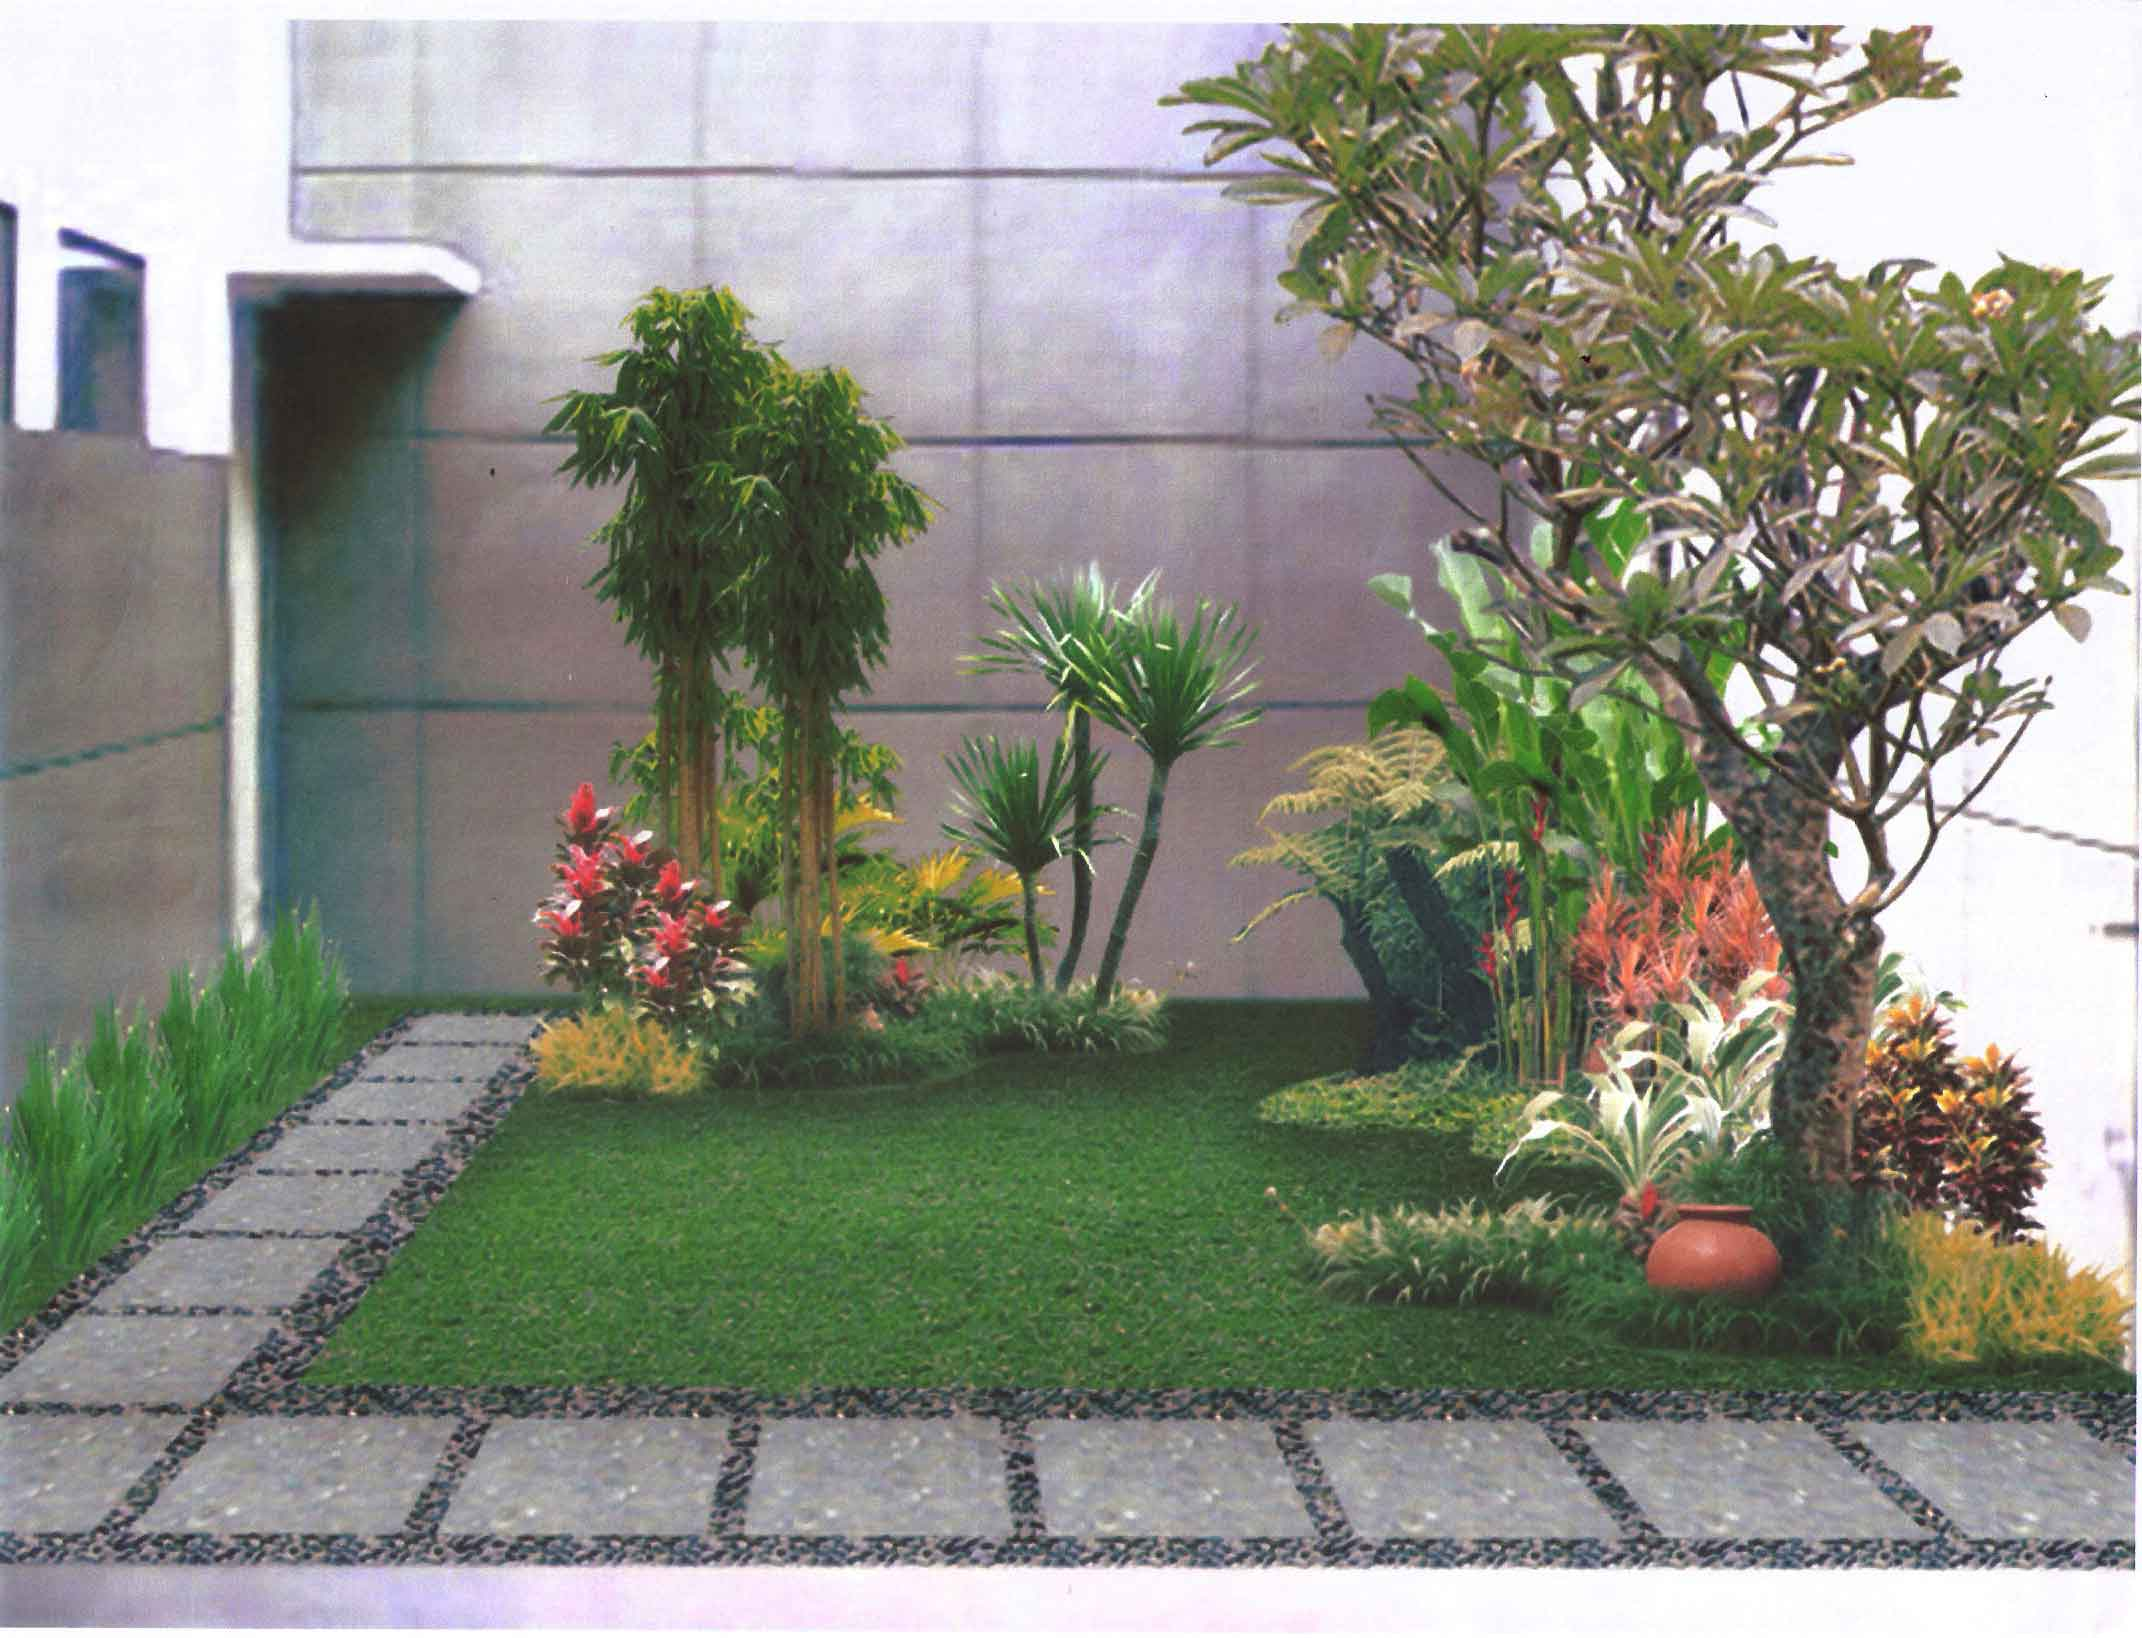 Merancang Design Taman Minimalis Rumah | EVA NOVIA Blog